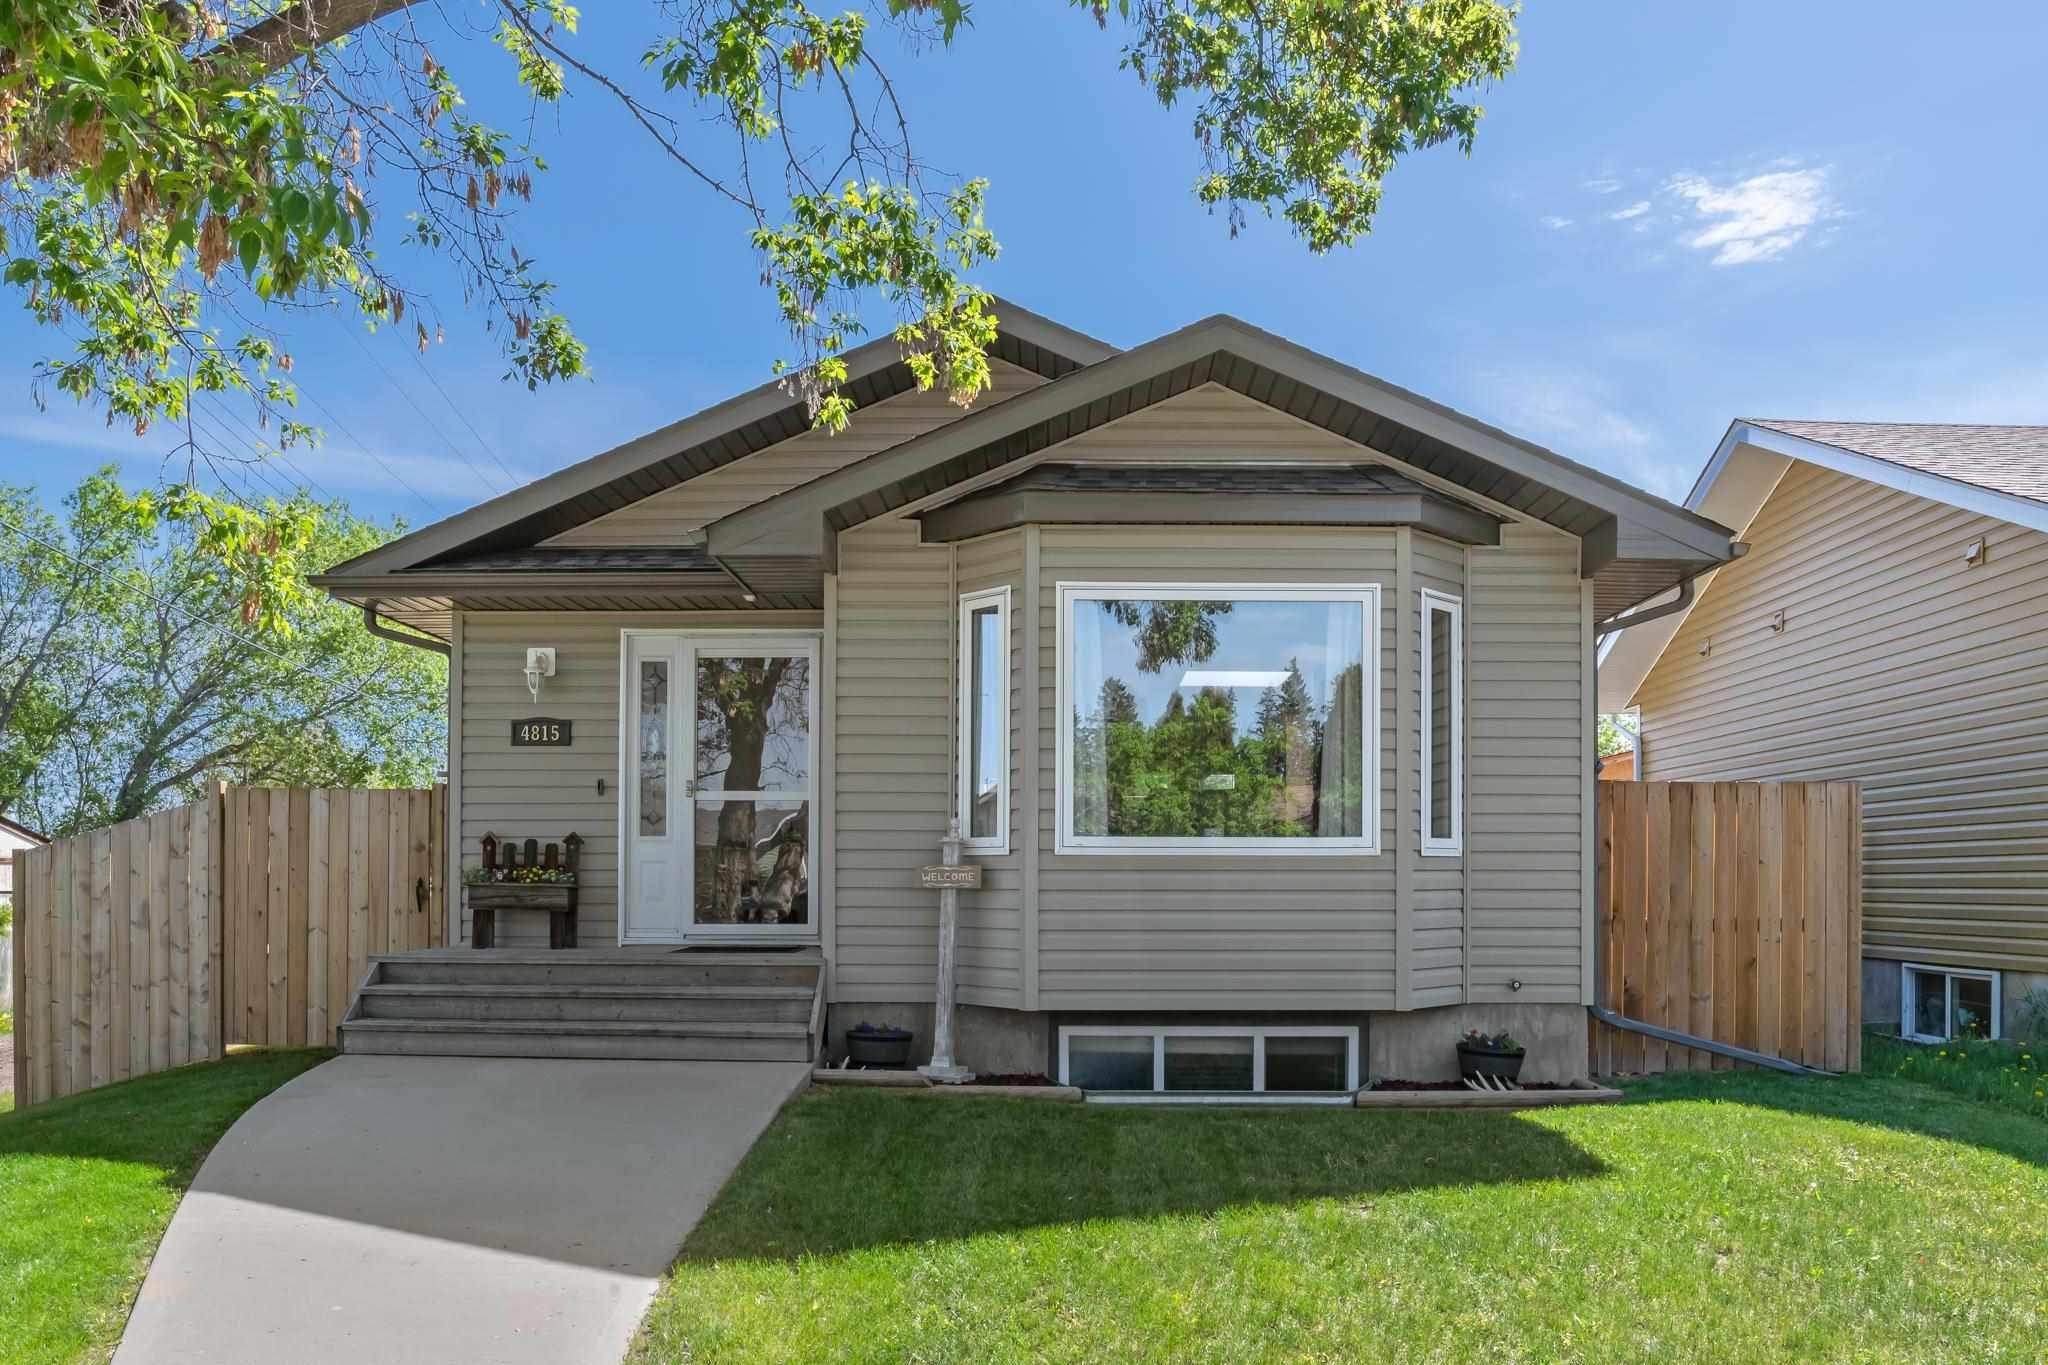 Main Photo: 4815 53 Street: Glendon House for sale : MLS®# E4226314